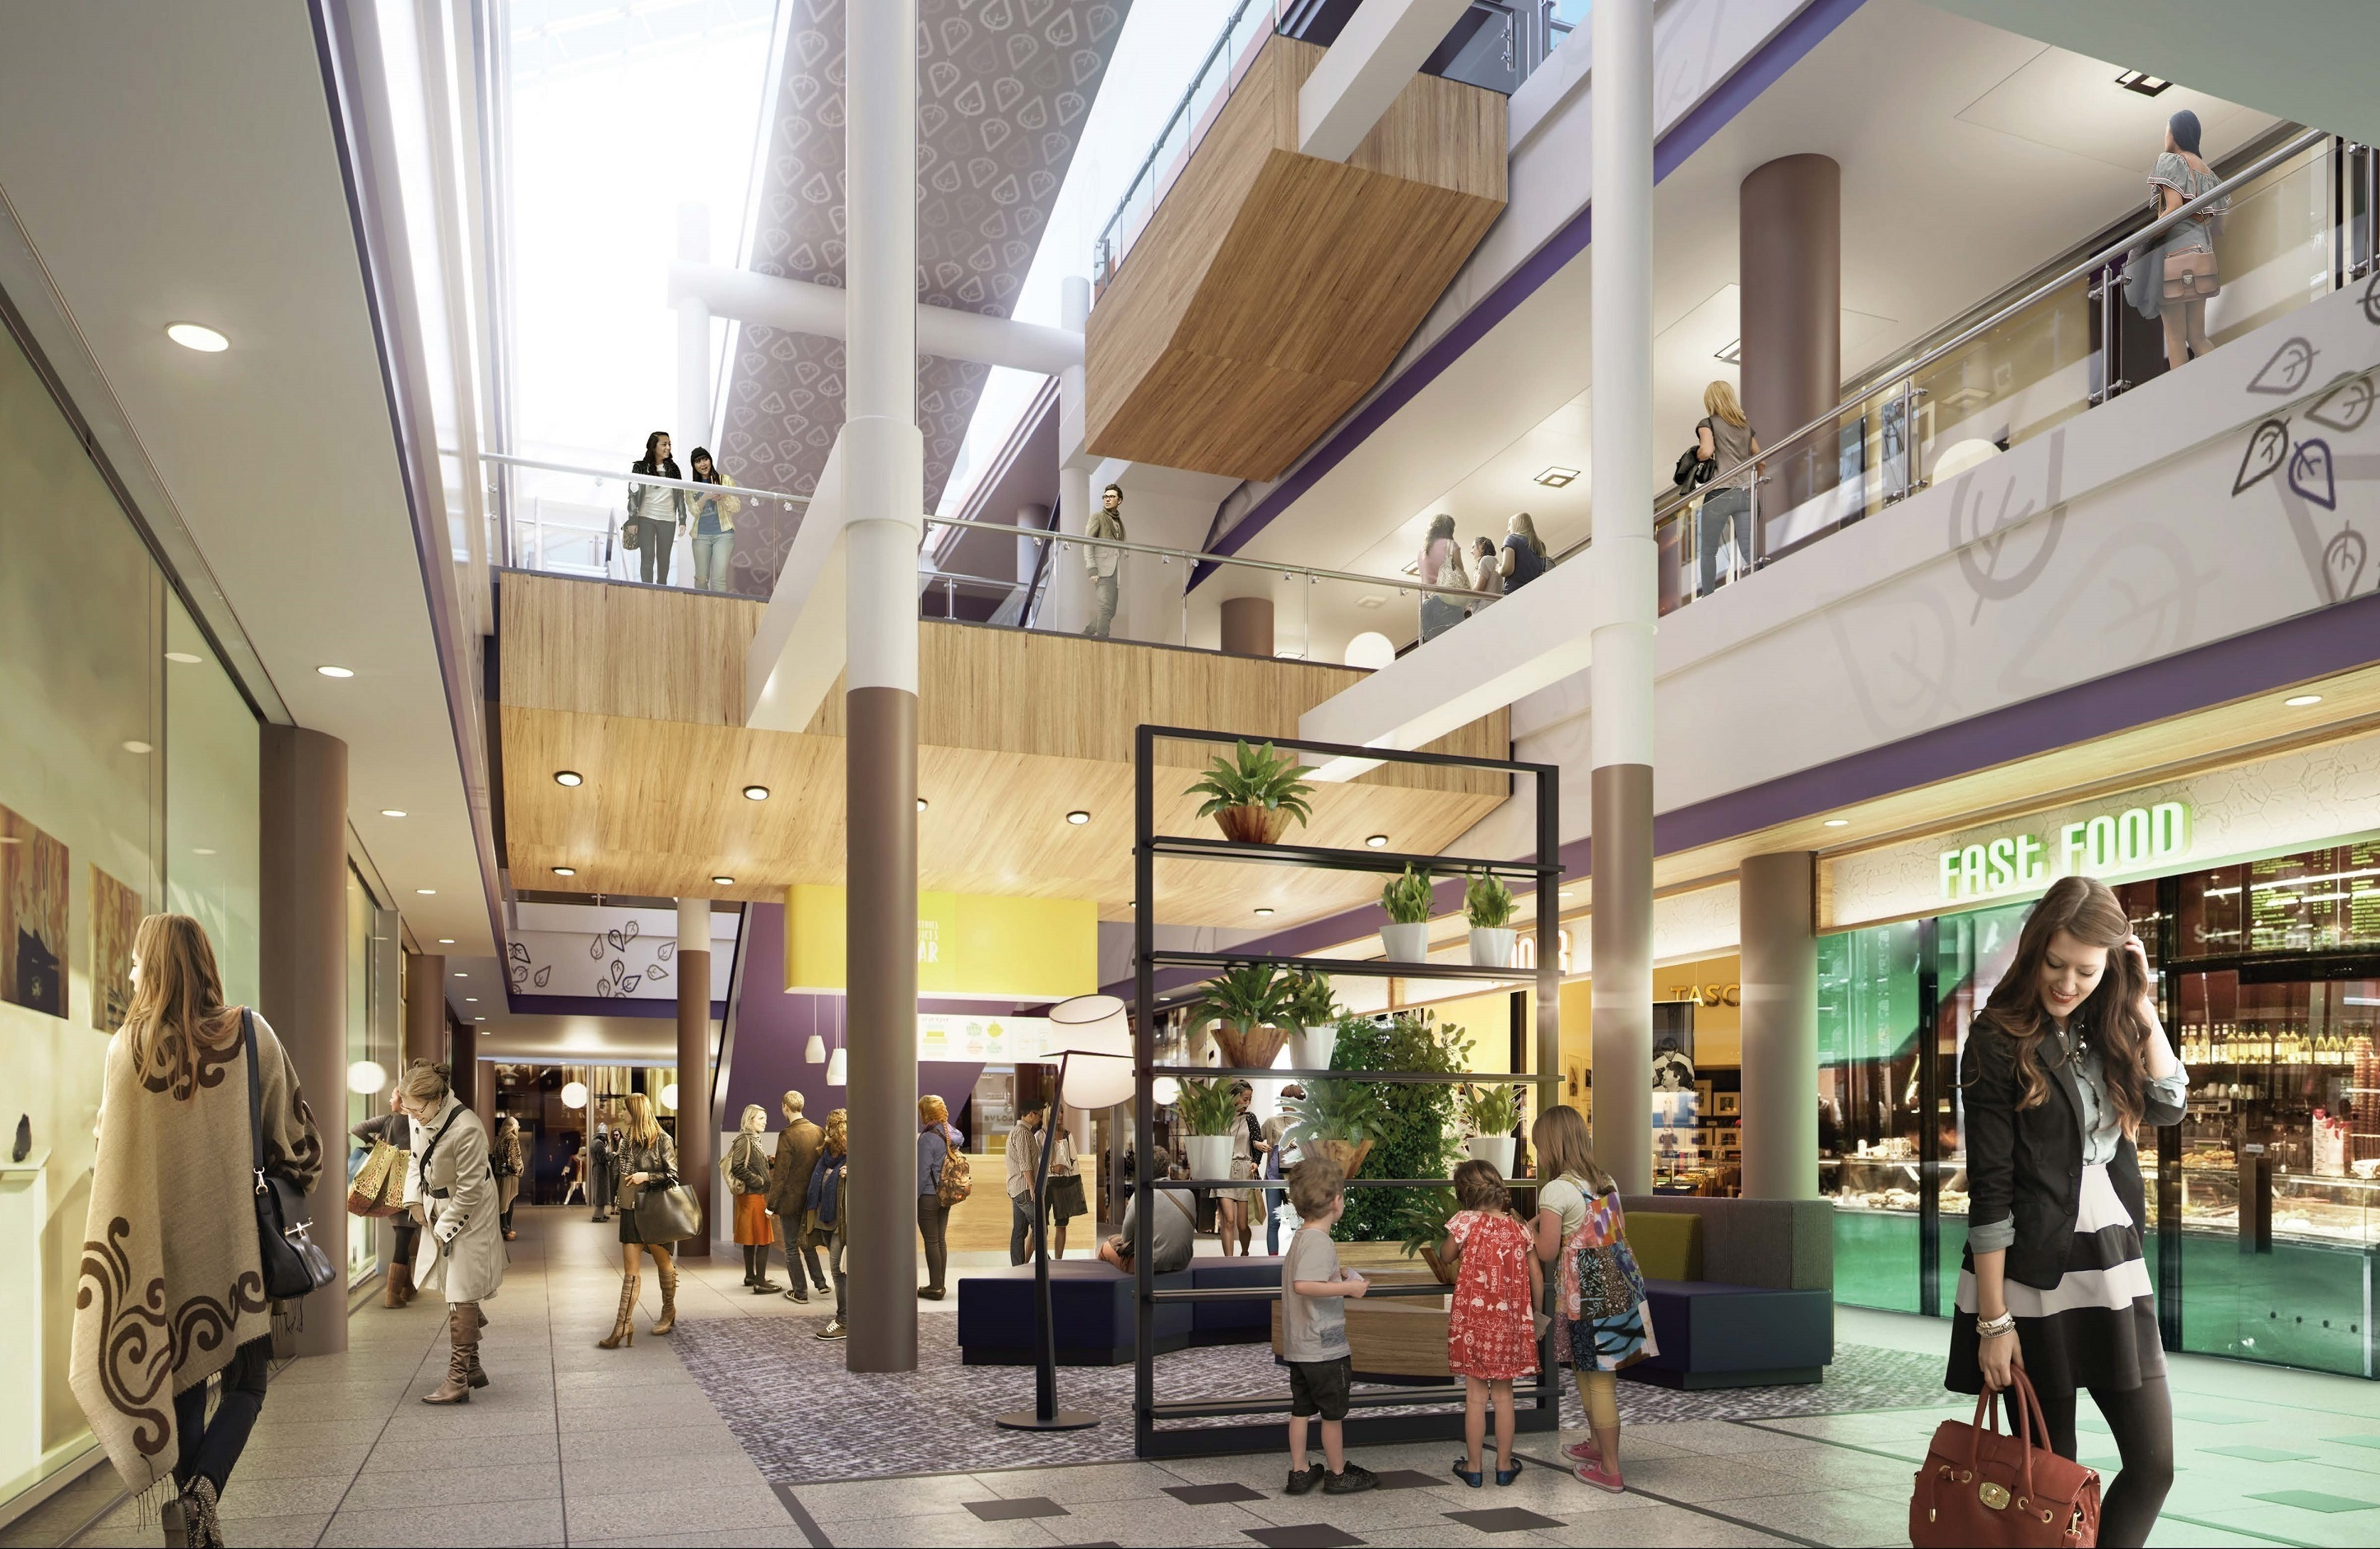 zuhause im shoppingpalast ece modernisiert gesundbrunnen center gesundbrunnen. Black Bedroom Furniture Sets. Home Design Ideas